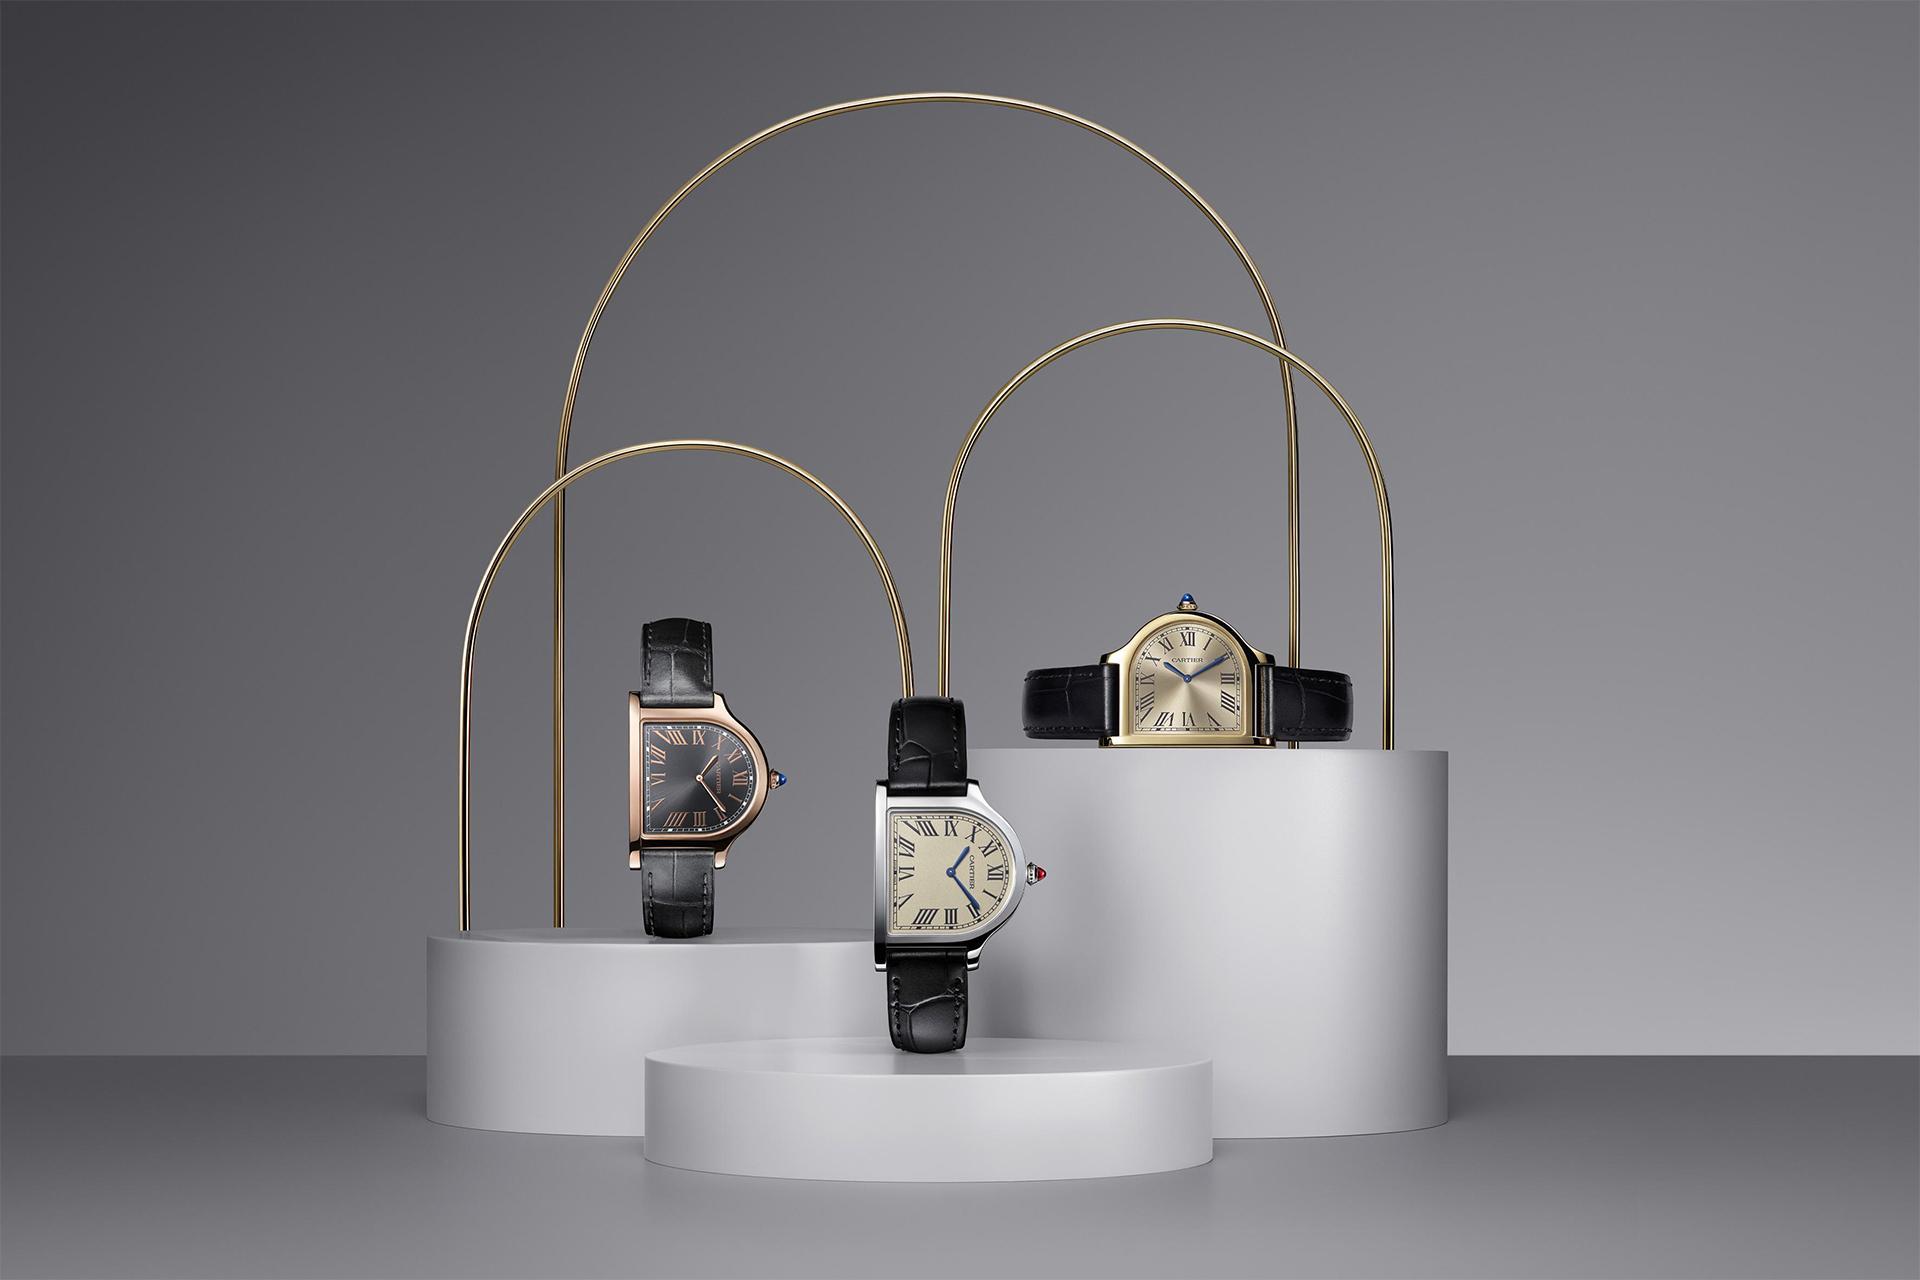 Cartier Privé Collection Cloche De Cartier watch 2021